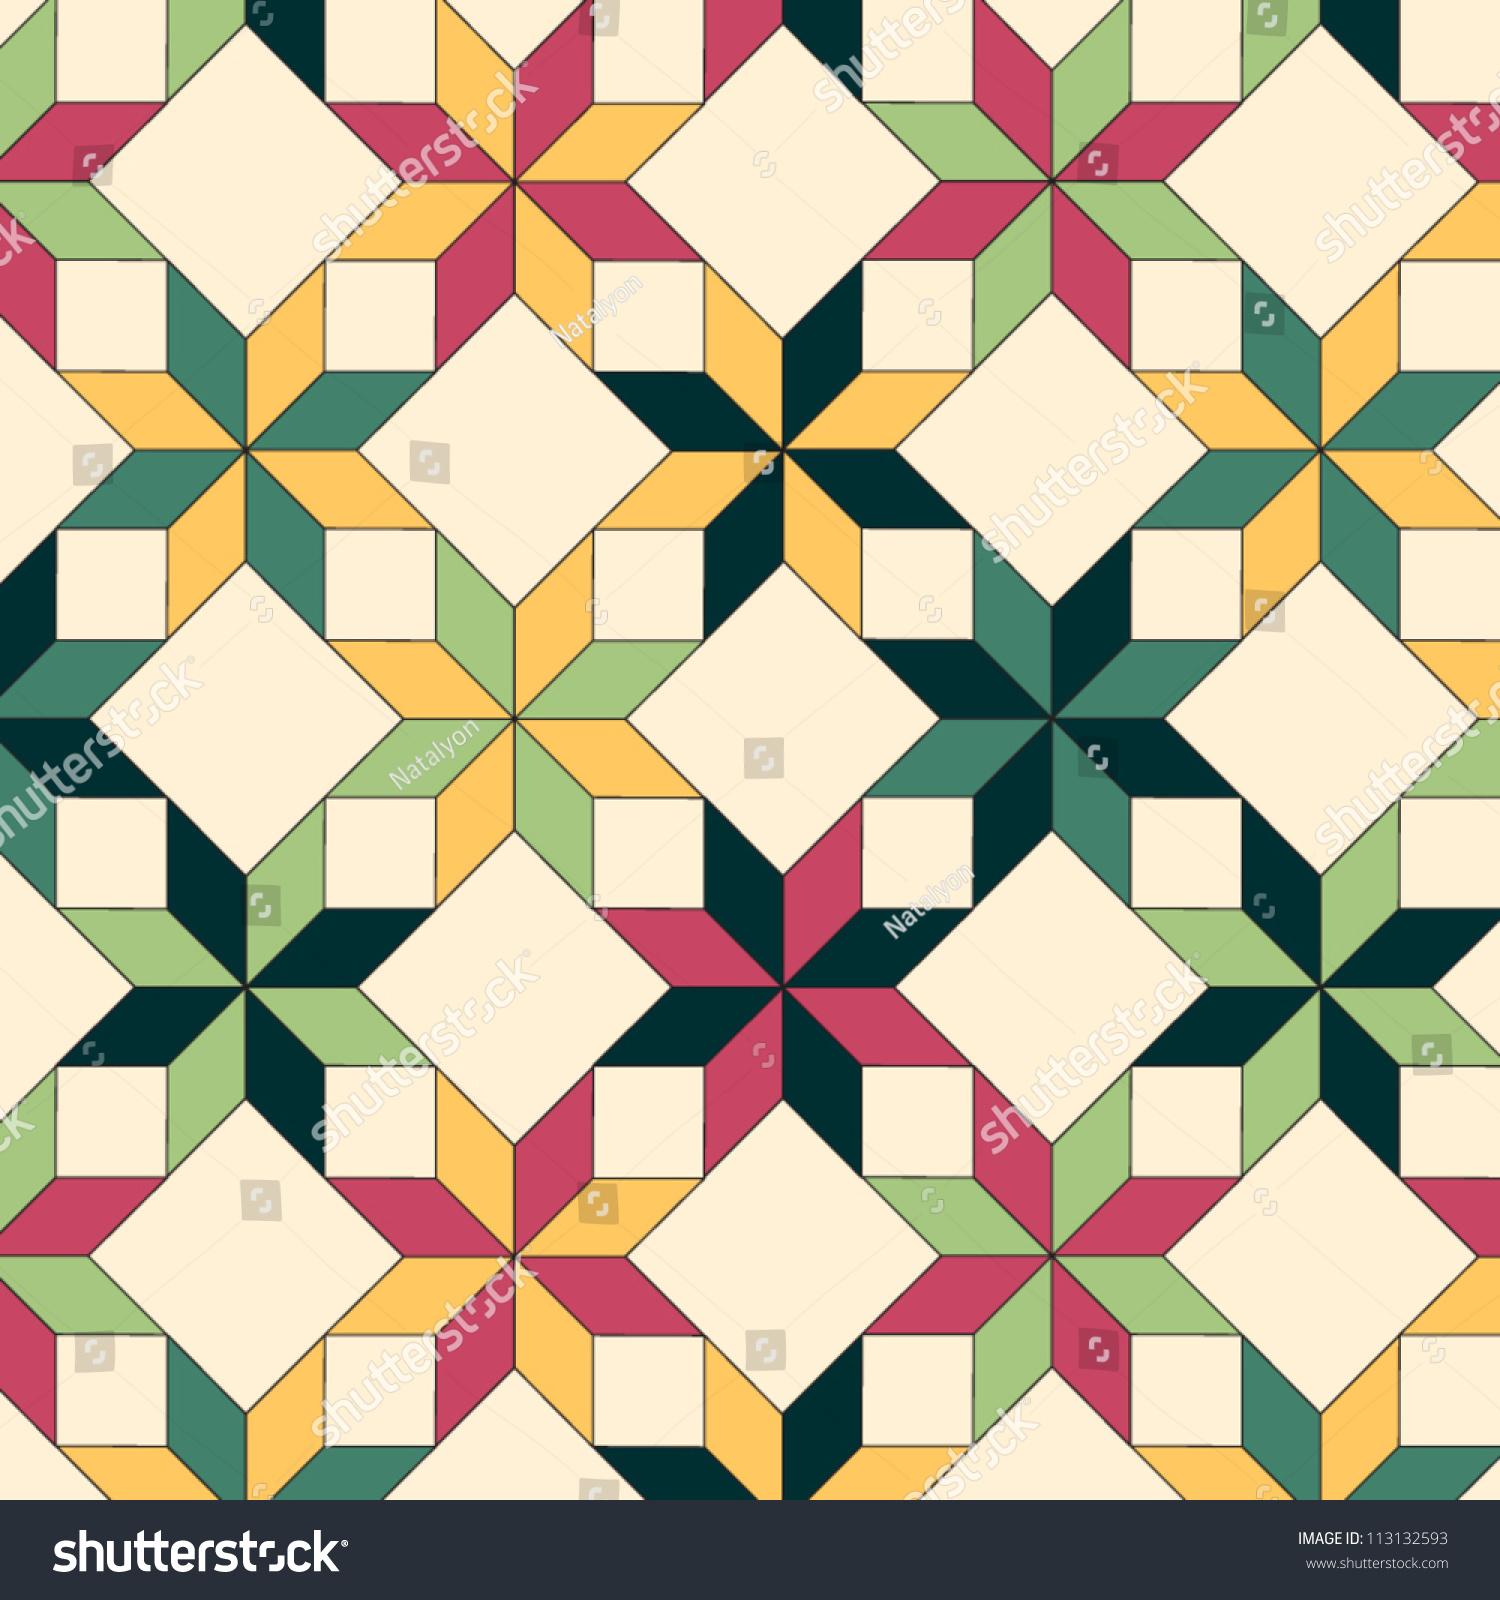 Triangle Quilt Pattern Texture Photos : Quilt Seamless Pattern Vector Stock Vector 113132593 - Shutterstock